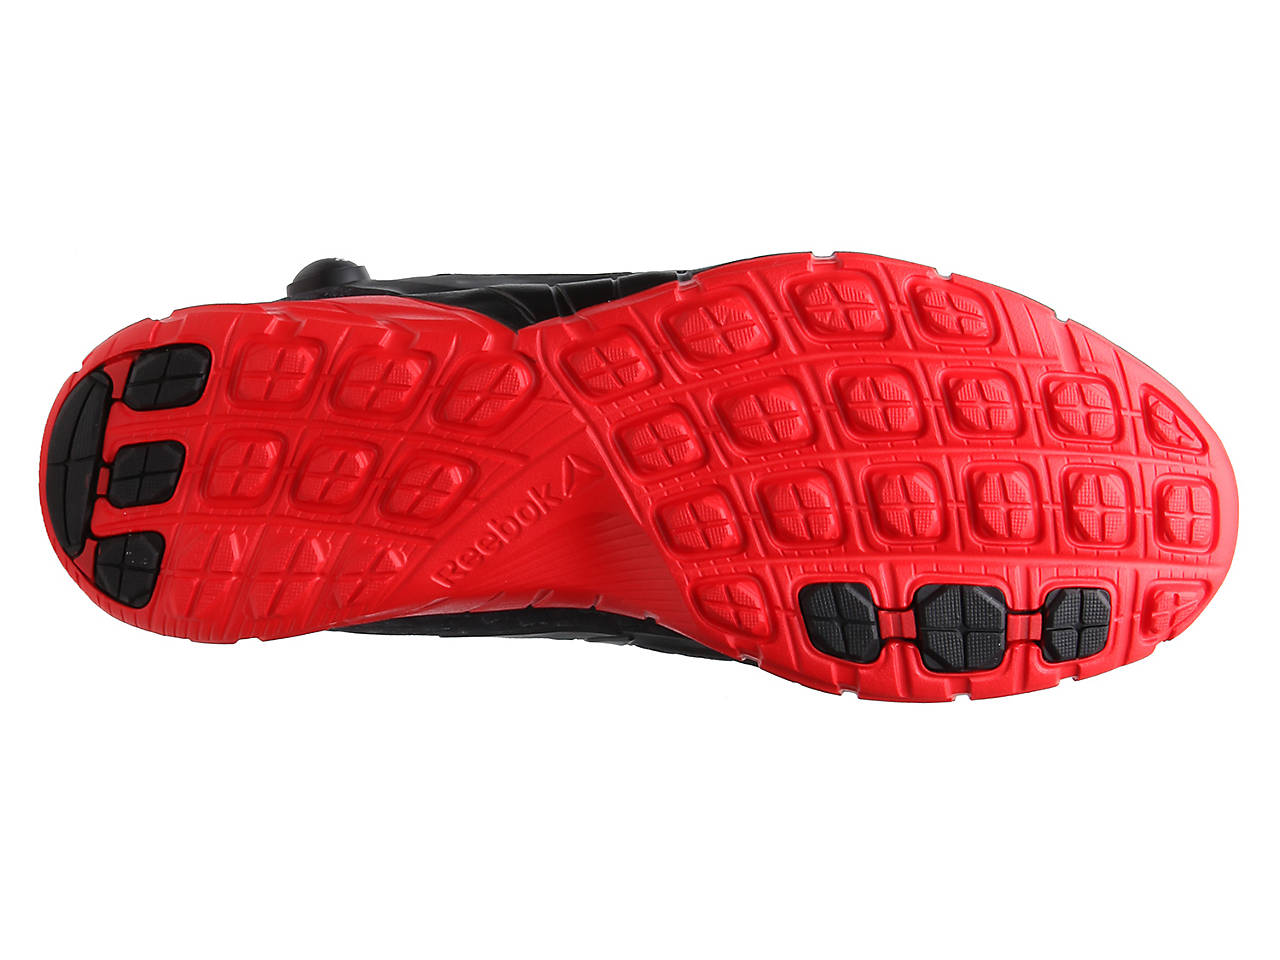 Reebok ZPump Fusion 2.5 Lightweight Running Shoe - Men s Men s Shoes ... 75bf9f8b9